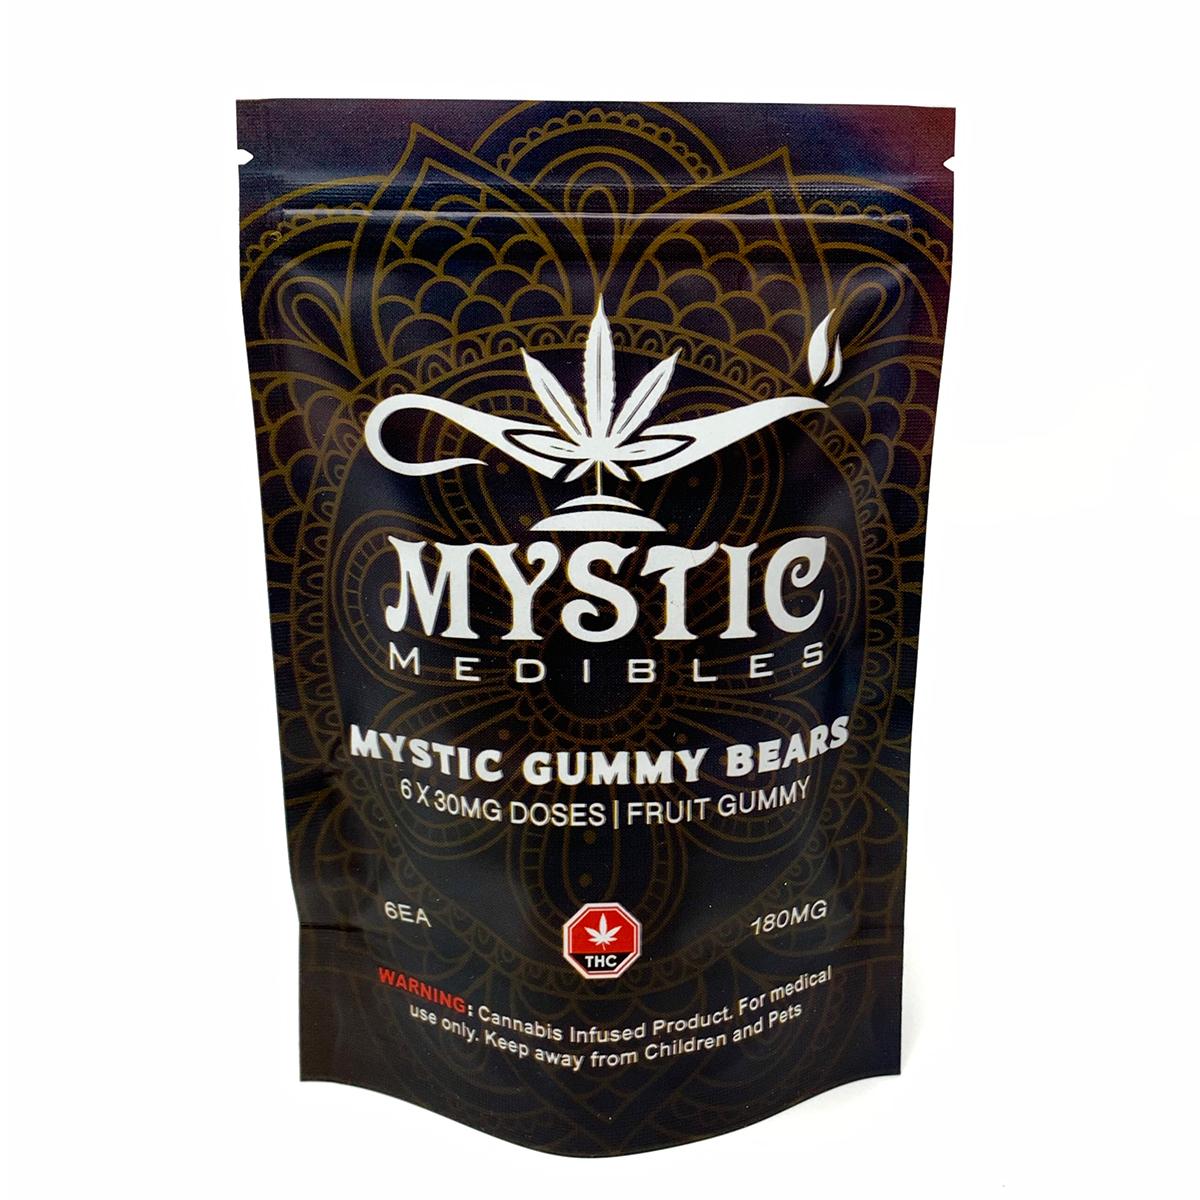 Buy Mystic Medibles - Mystic Gummy Bears 180mg Online